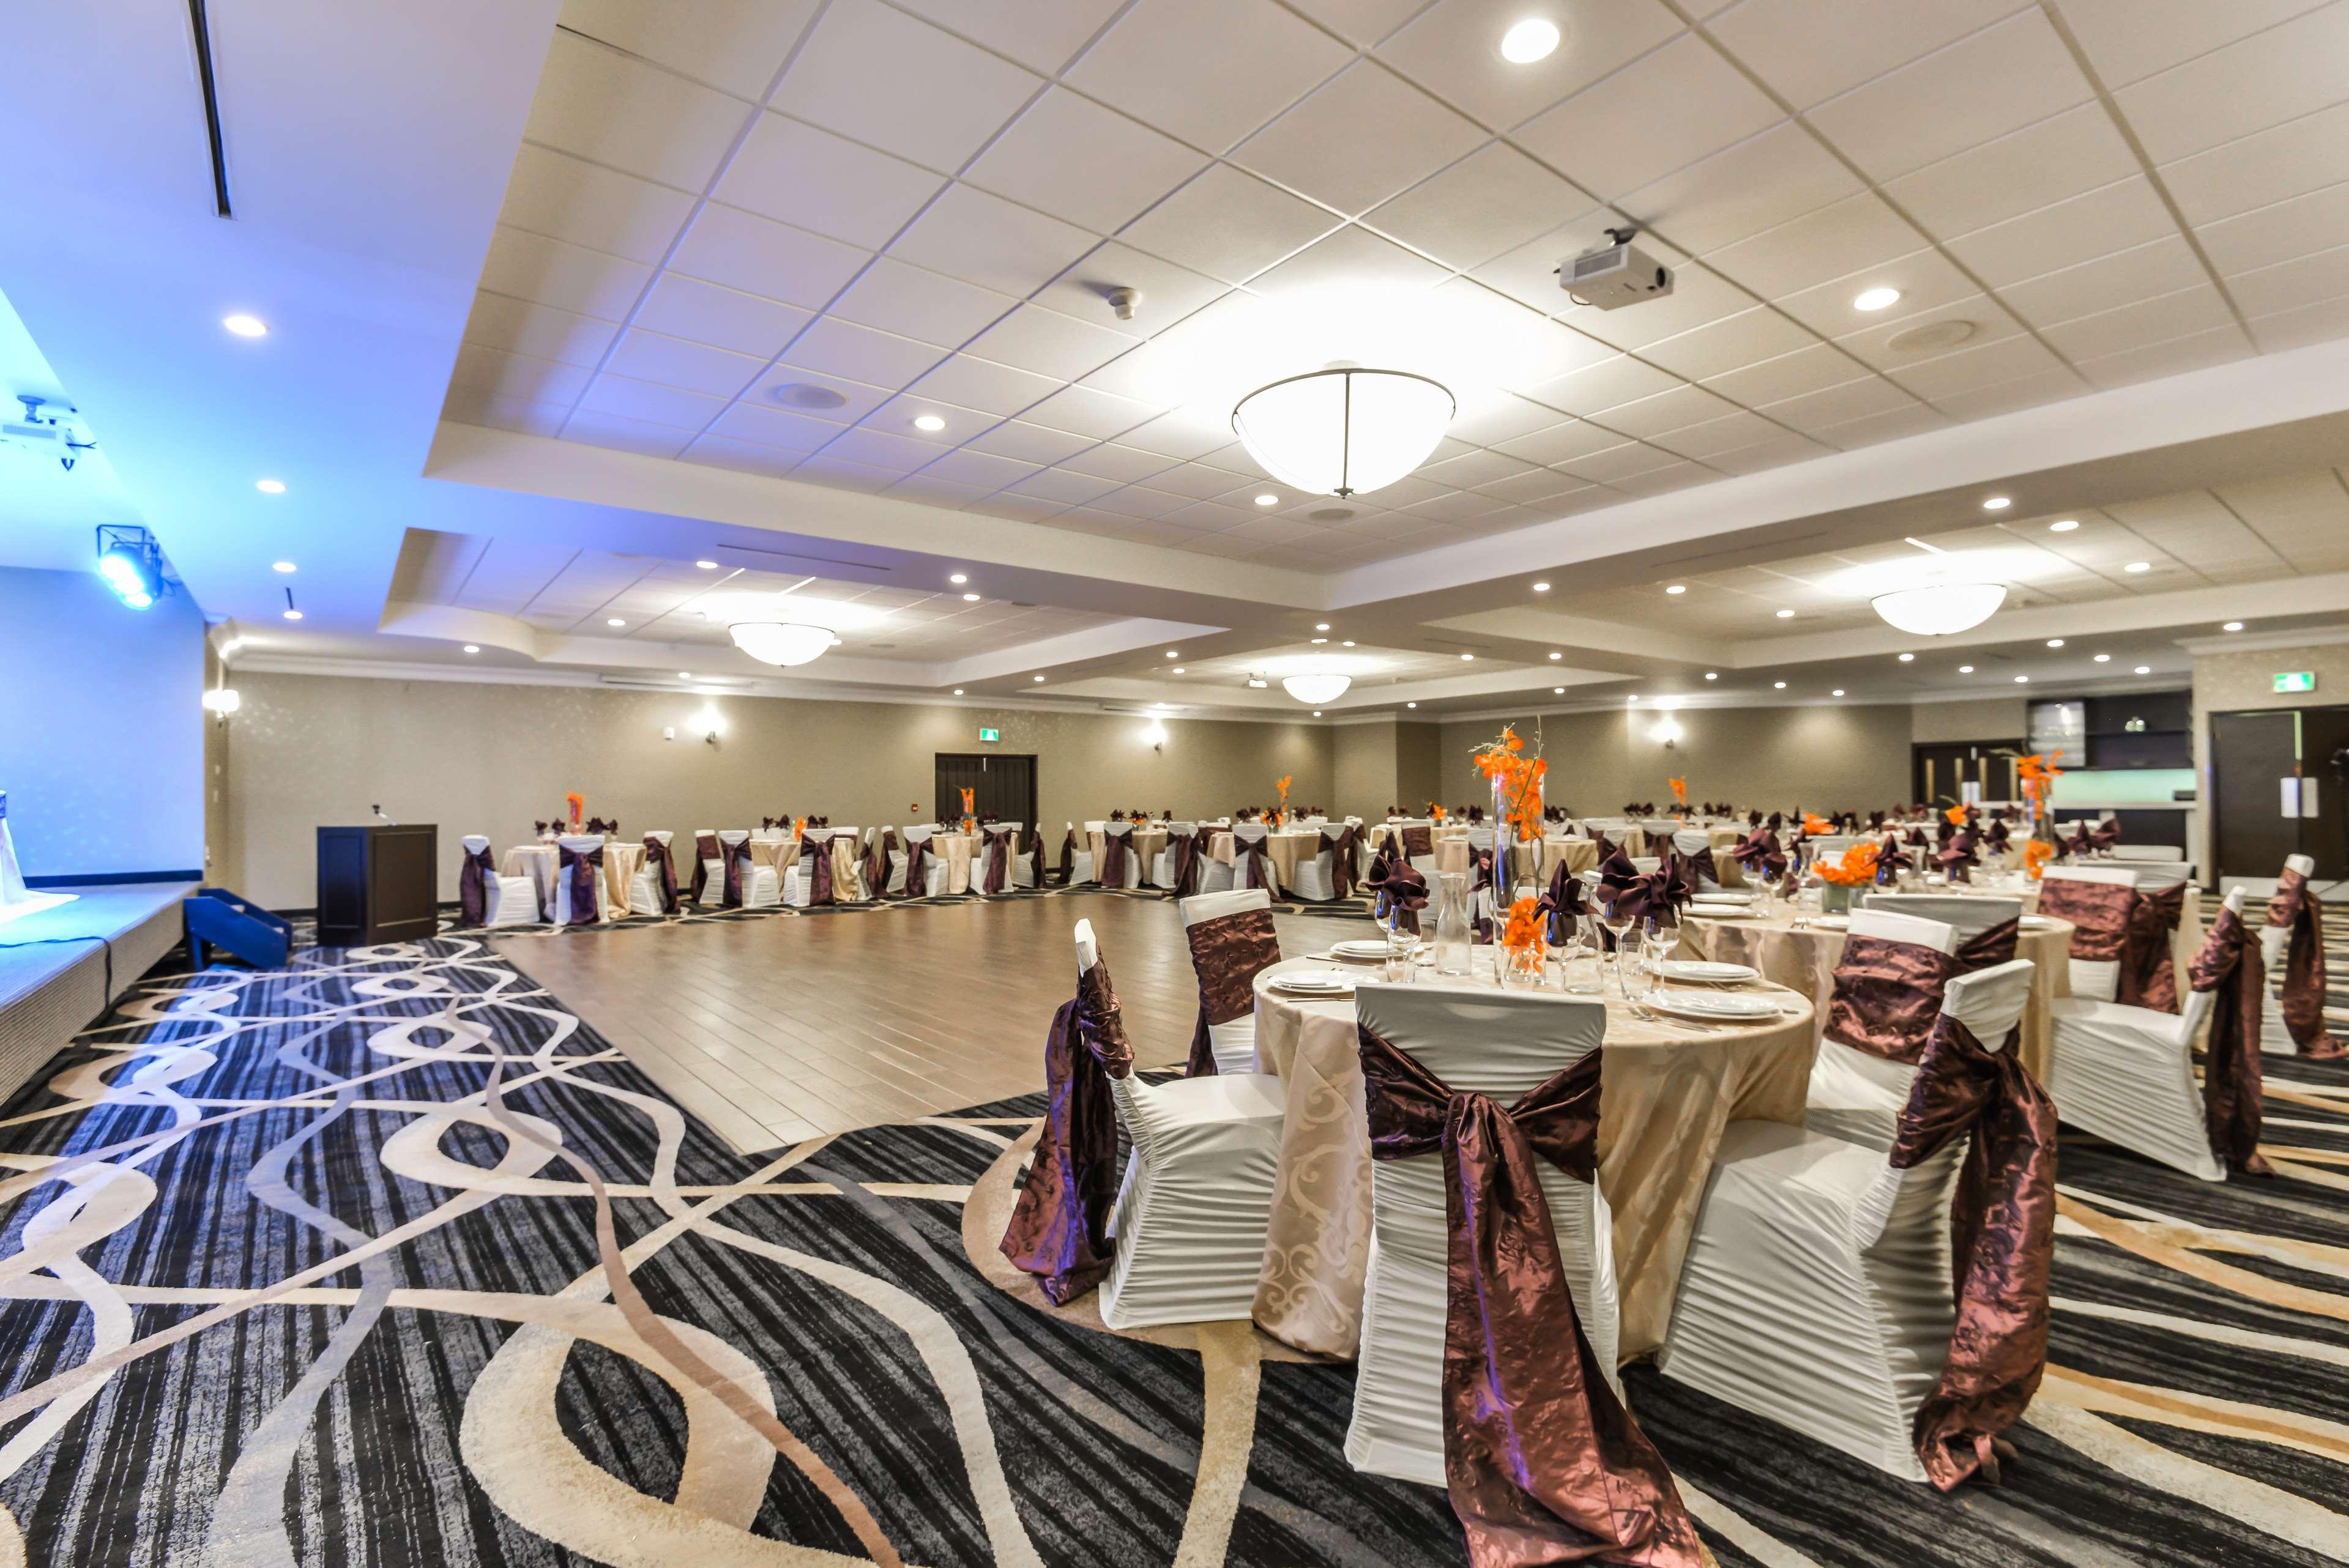 Weddings Best Western Plus Leamington Hotel & Conference Centre Leamington (519)326-8646